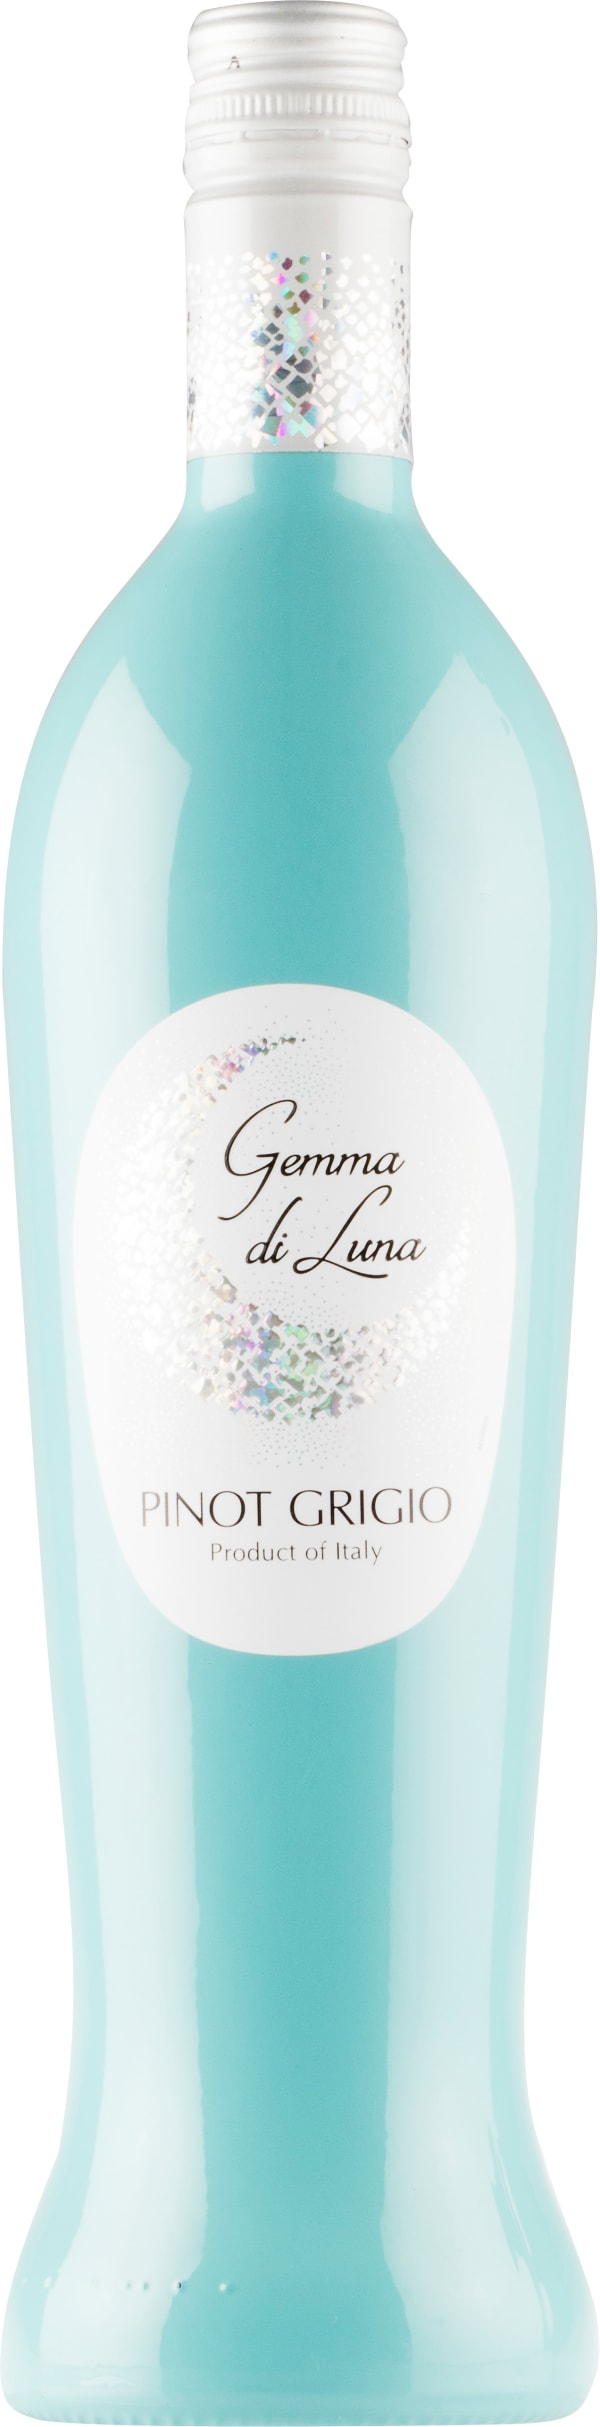 Gemma di Luna Pinot Grigio 2019